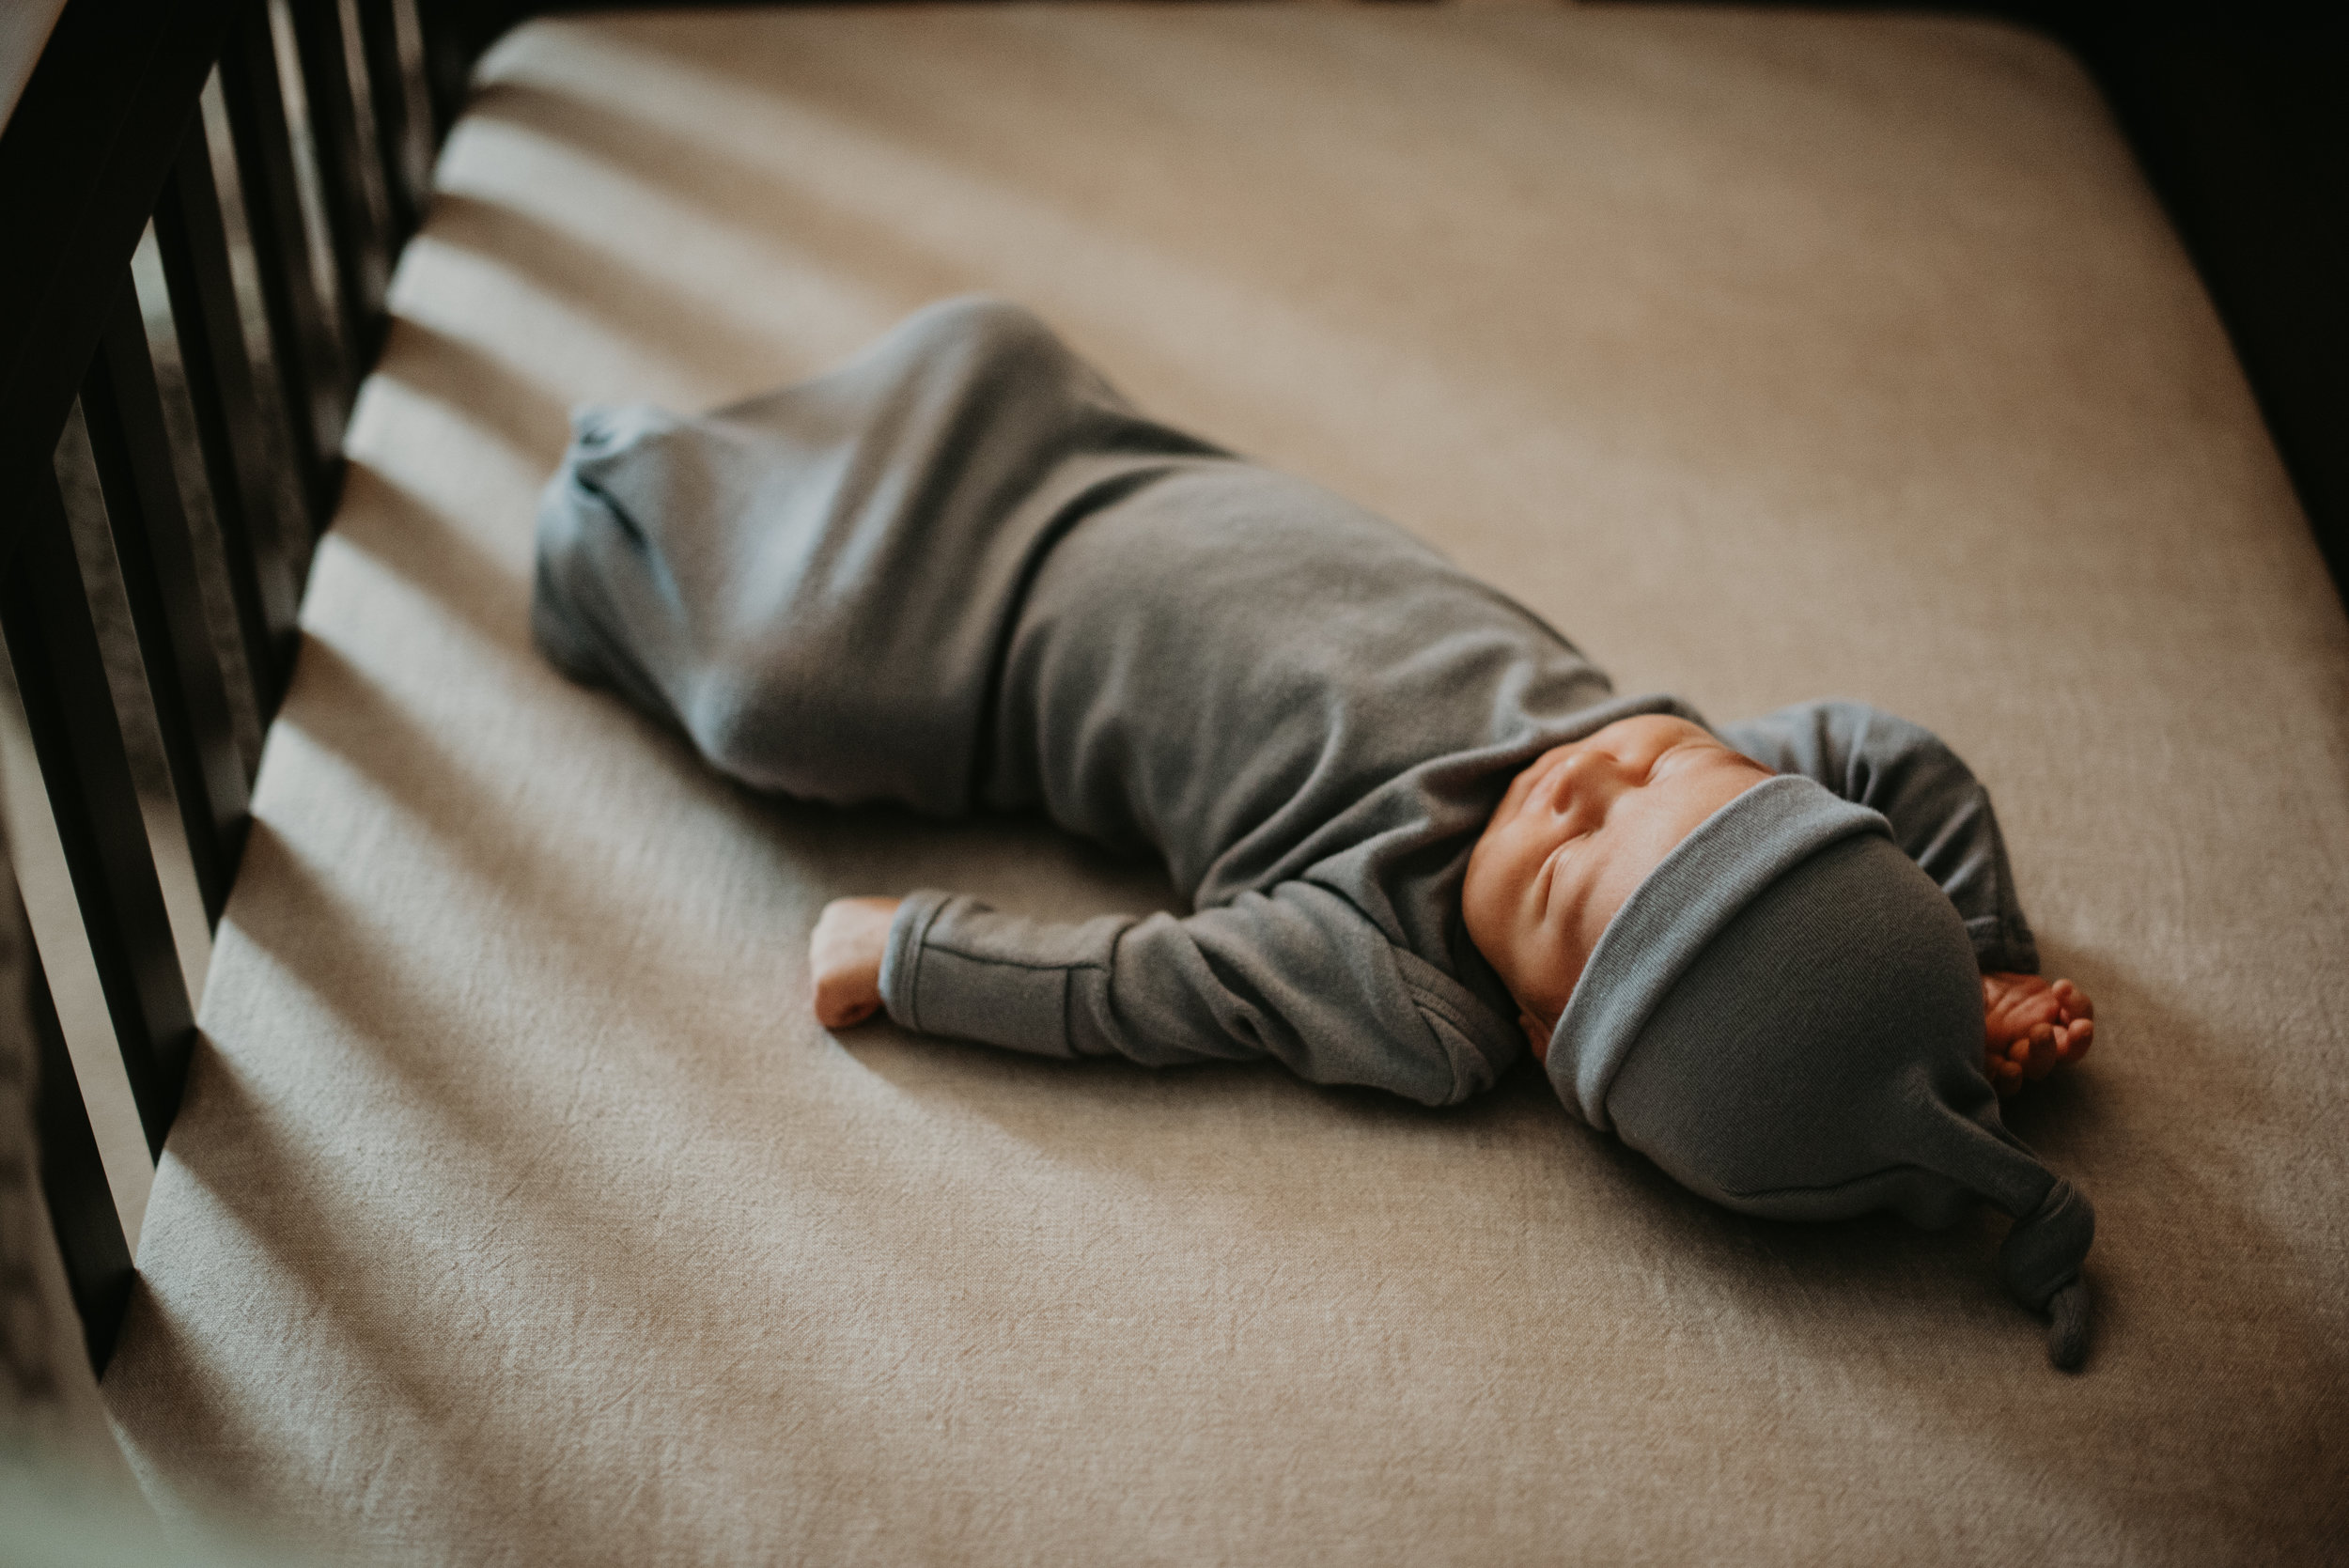 newborn baby boy lays in crib for in-home photos atlanta